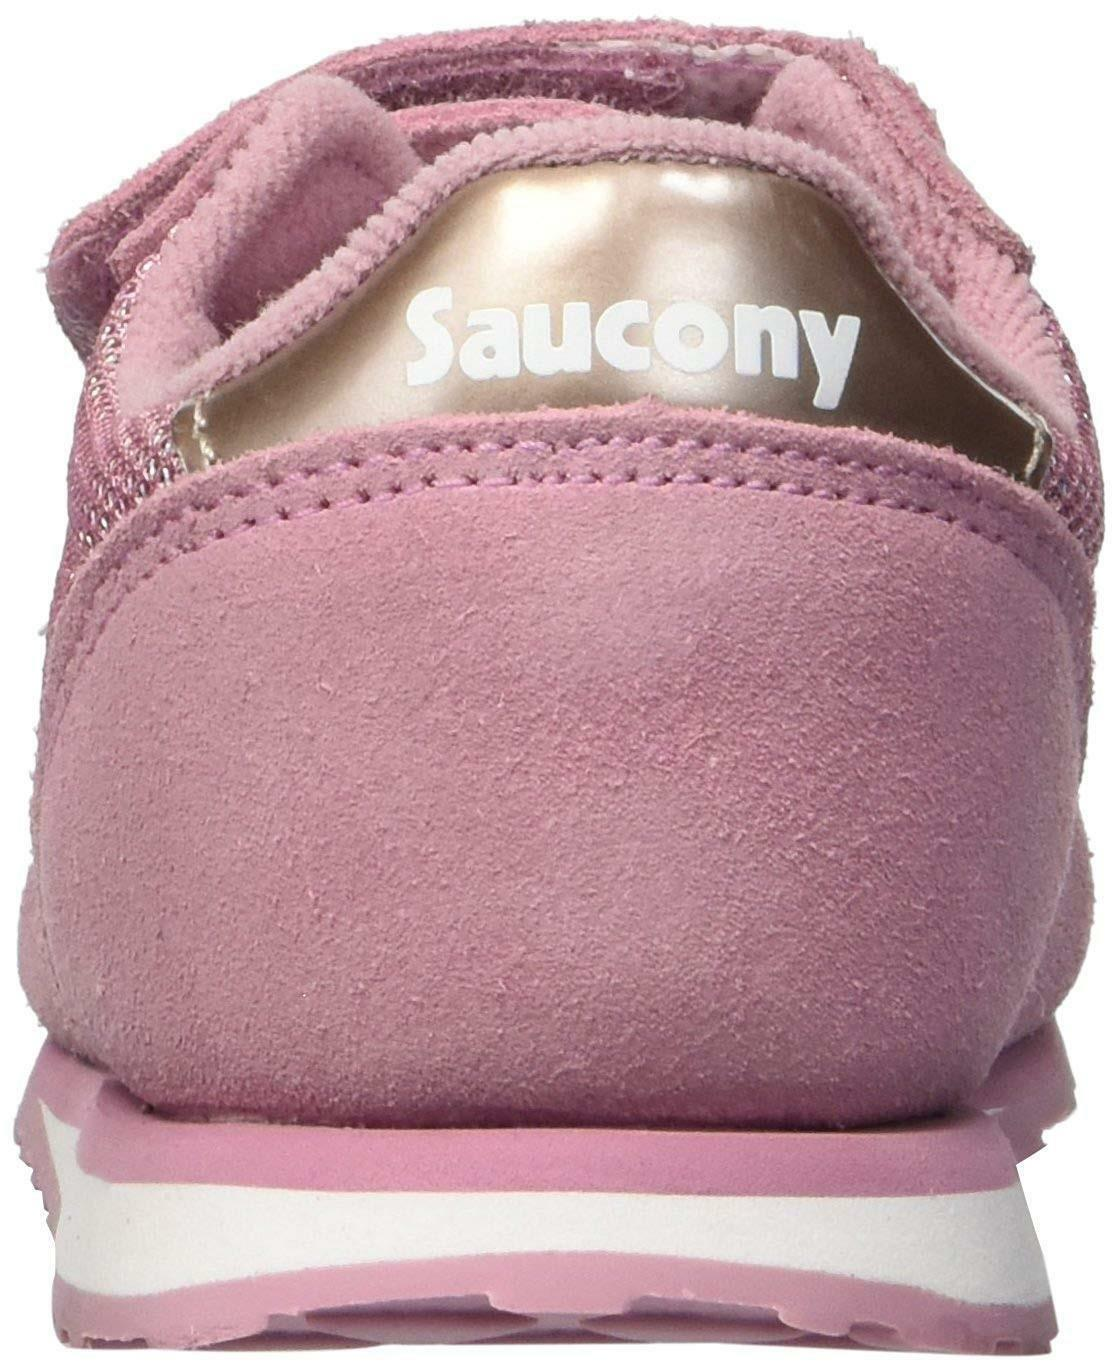 Saucony jazz scarpe sportive bambina rosa strappo sl159644